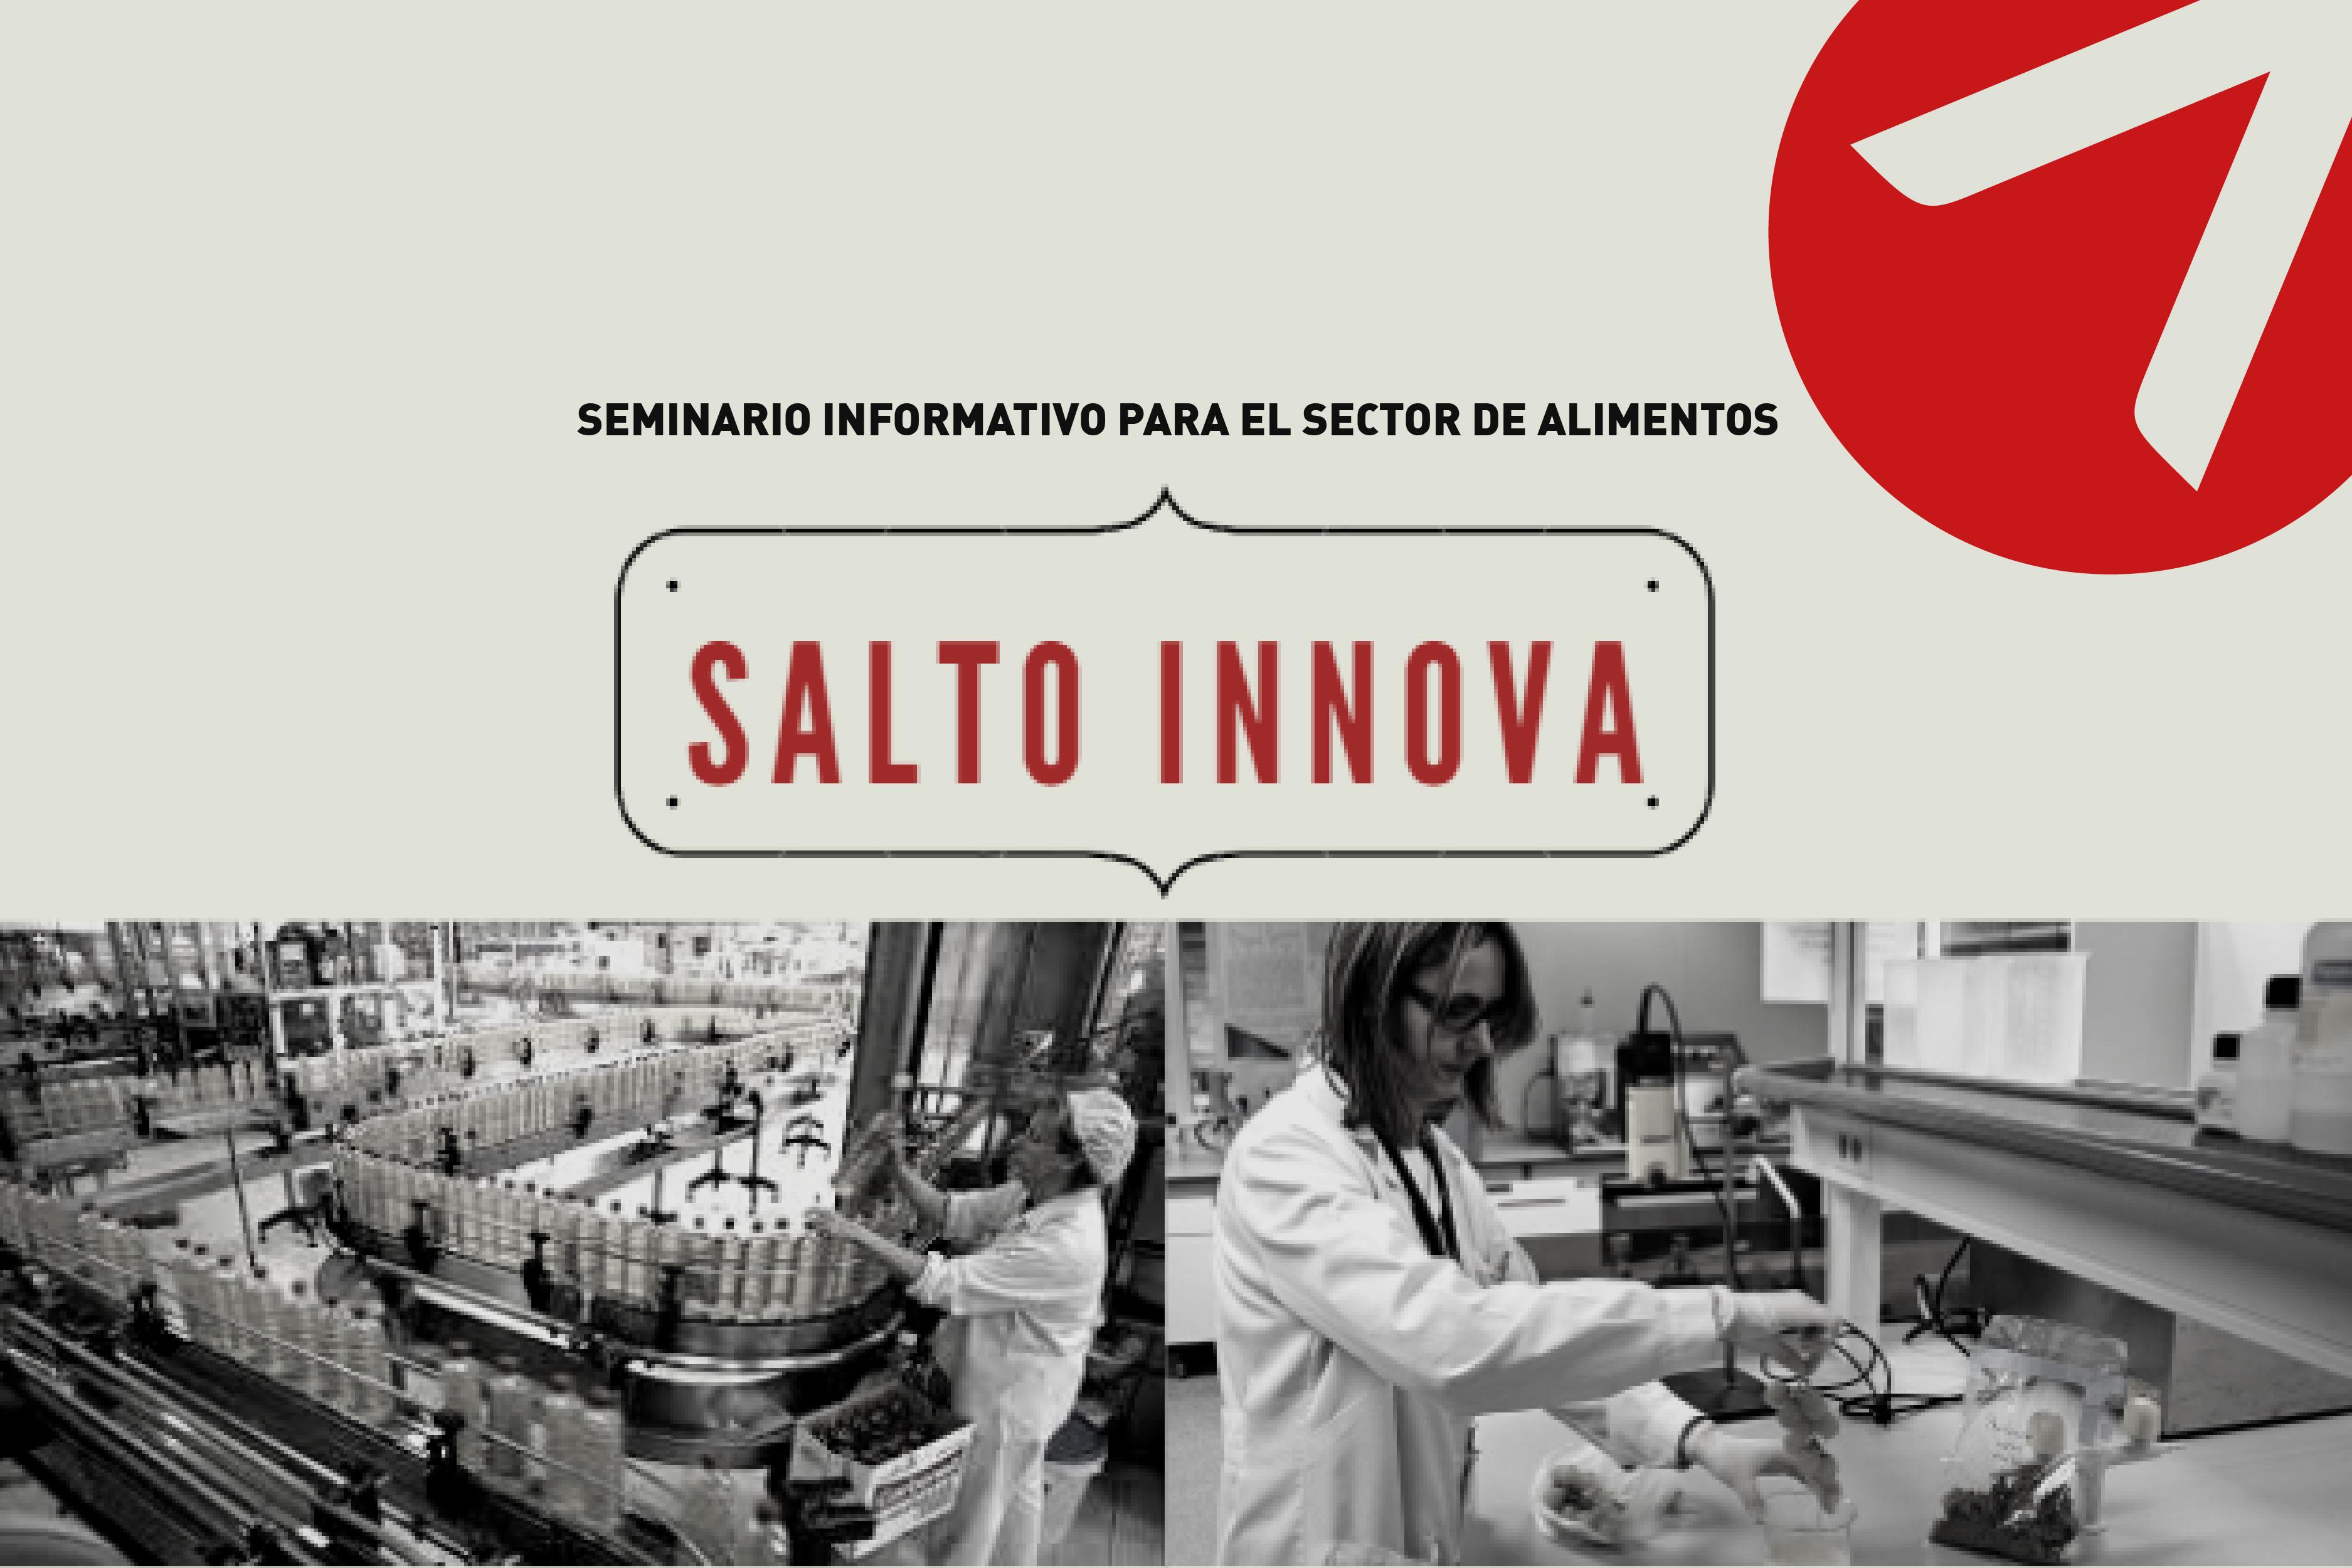 Seminario informativo: Salto Innova